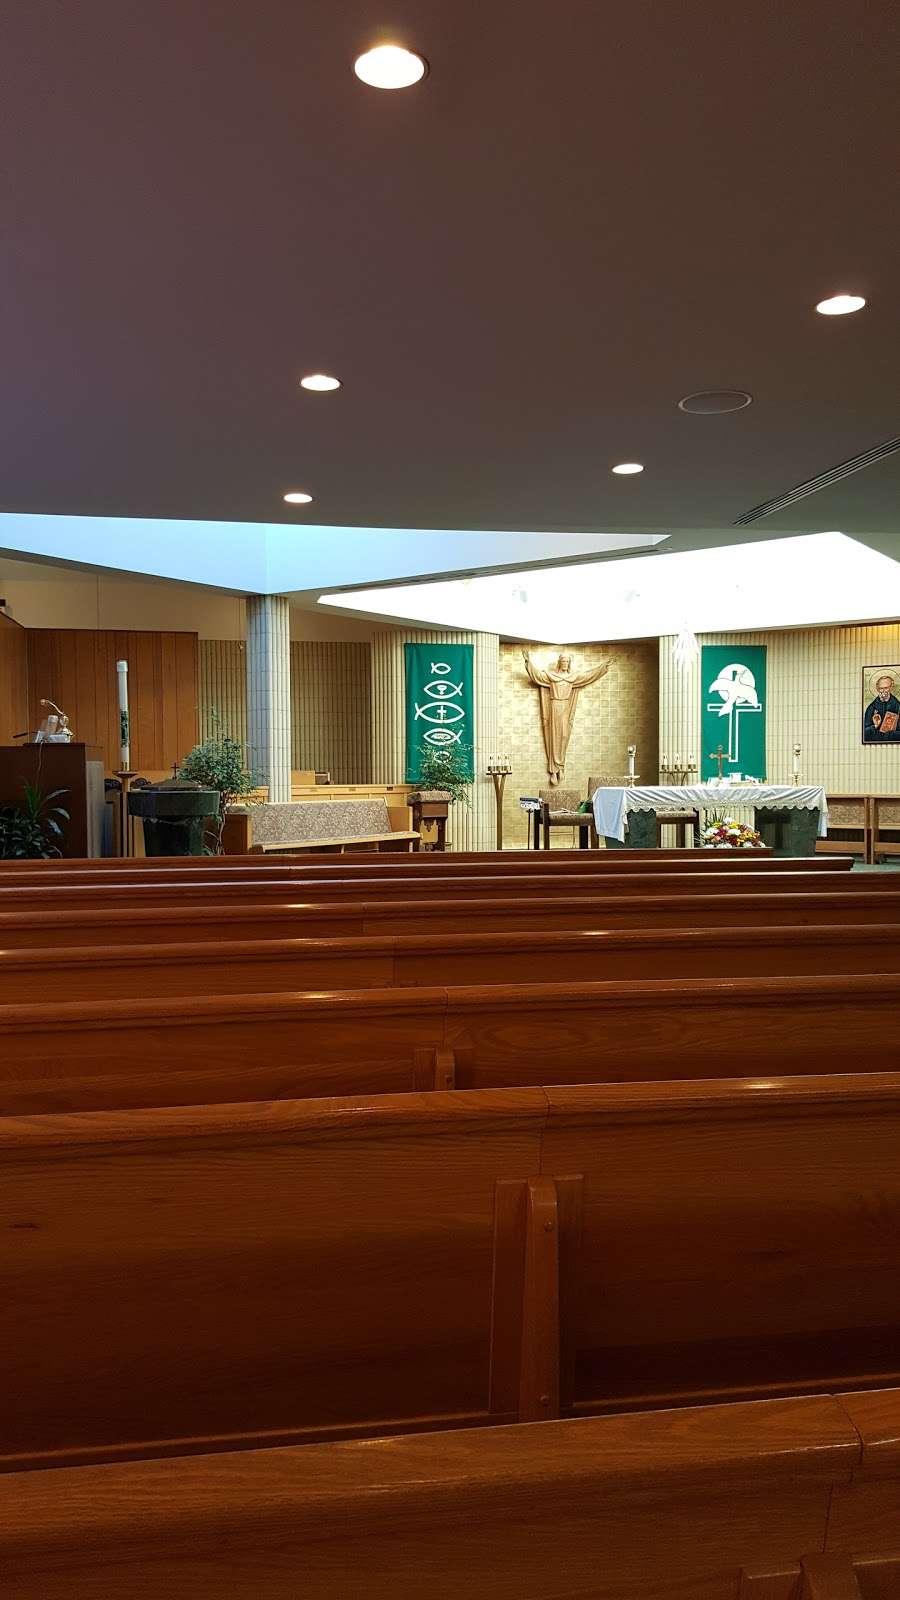 St Columba Church - church    Photo 10 of 10   Address: 2245 Kimball St, Brooklyn, NY 11234, USA   Phone: (718) 338-6265